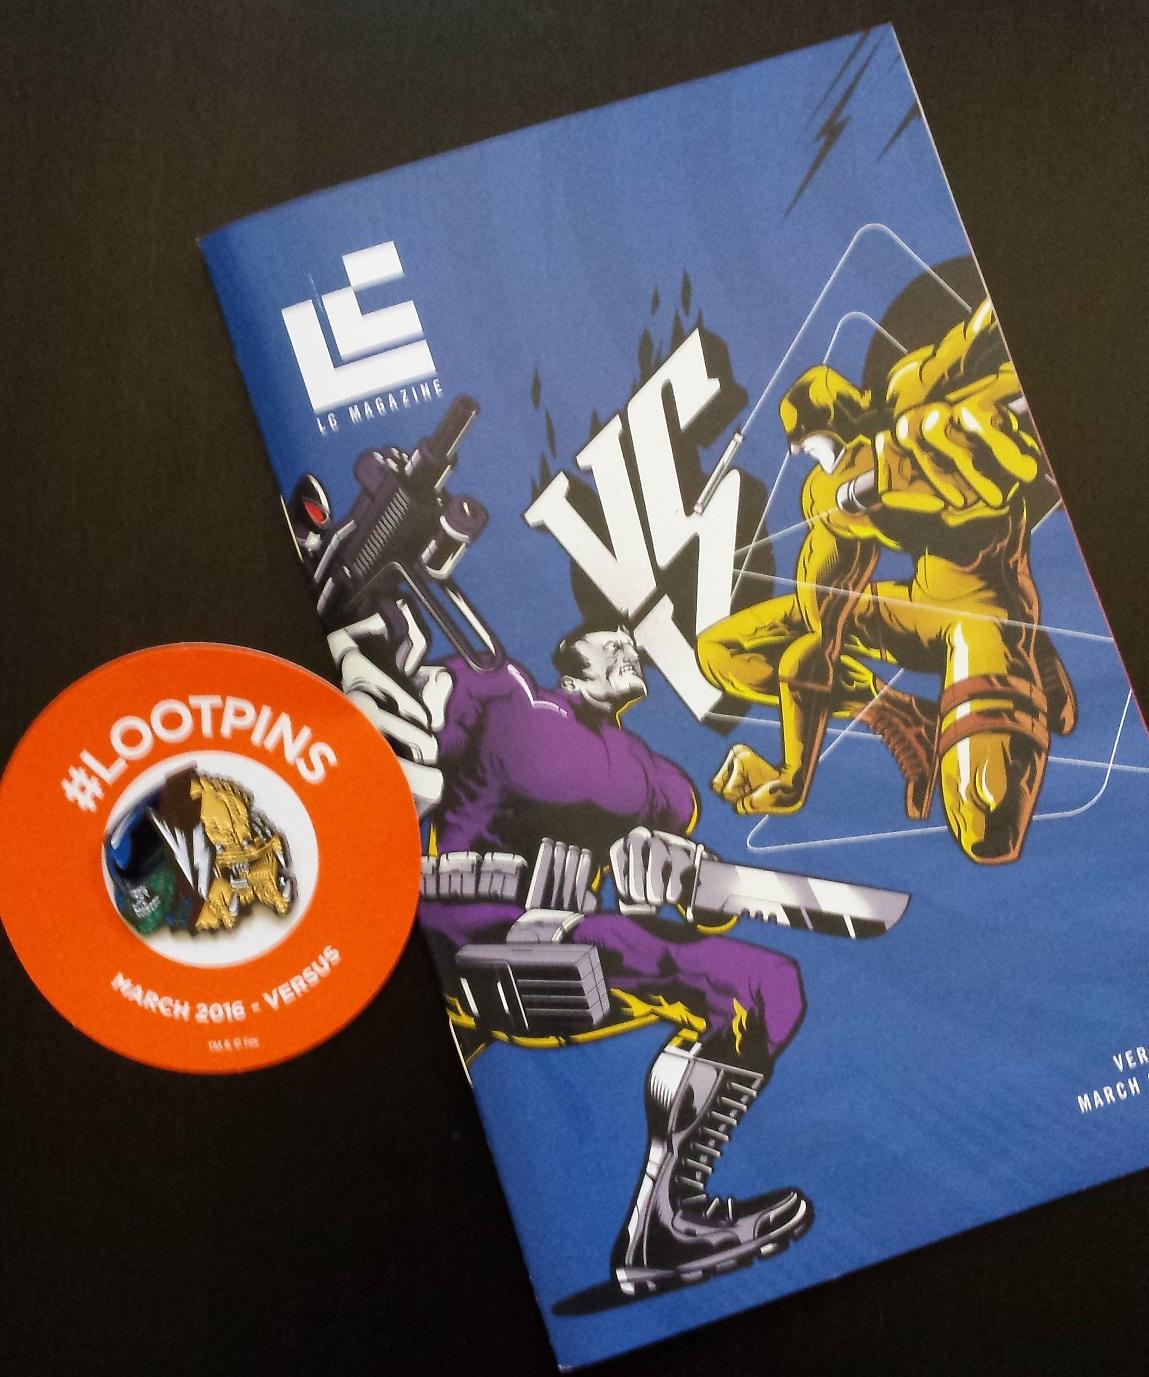 Loot crate, magazine cover, loot crate versus